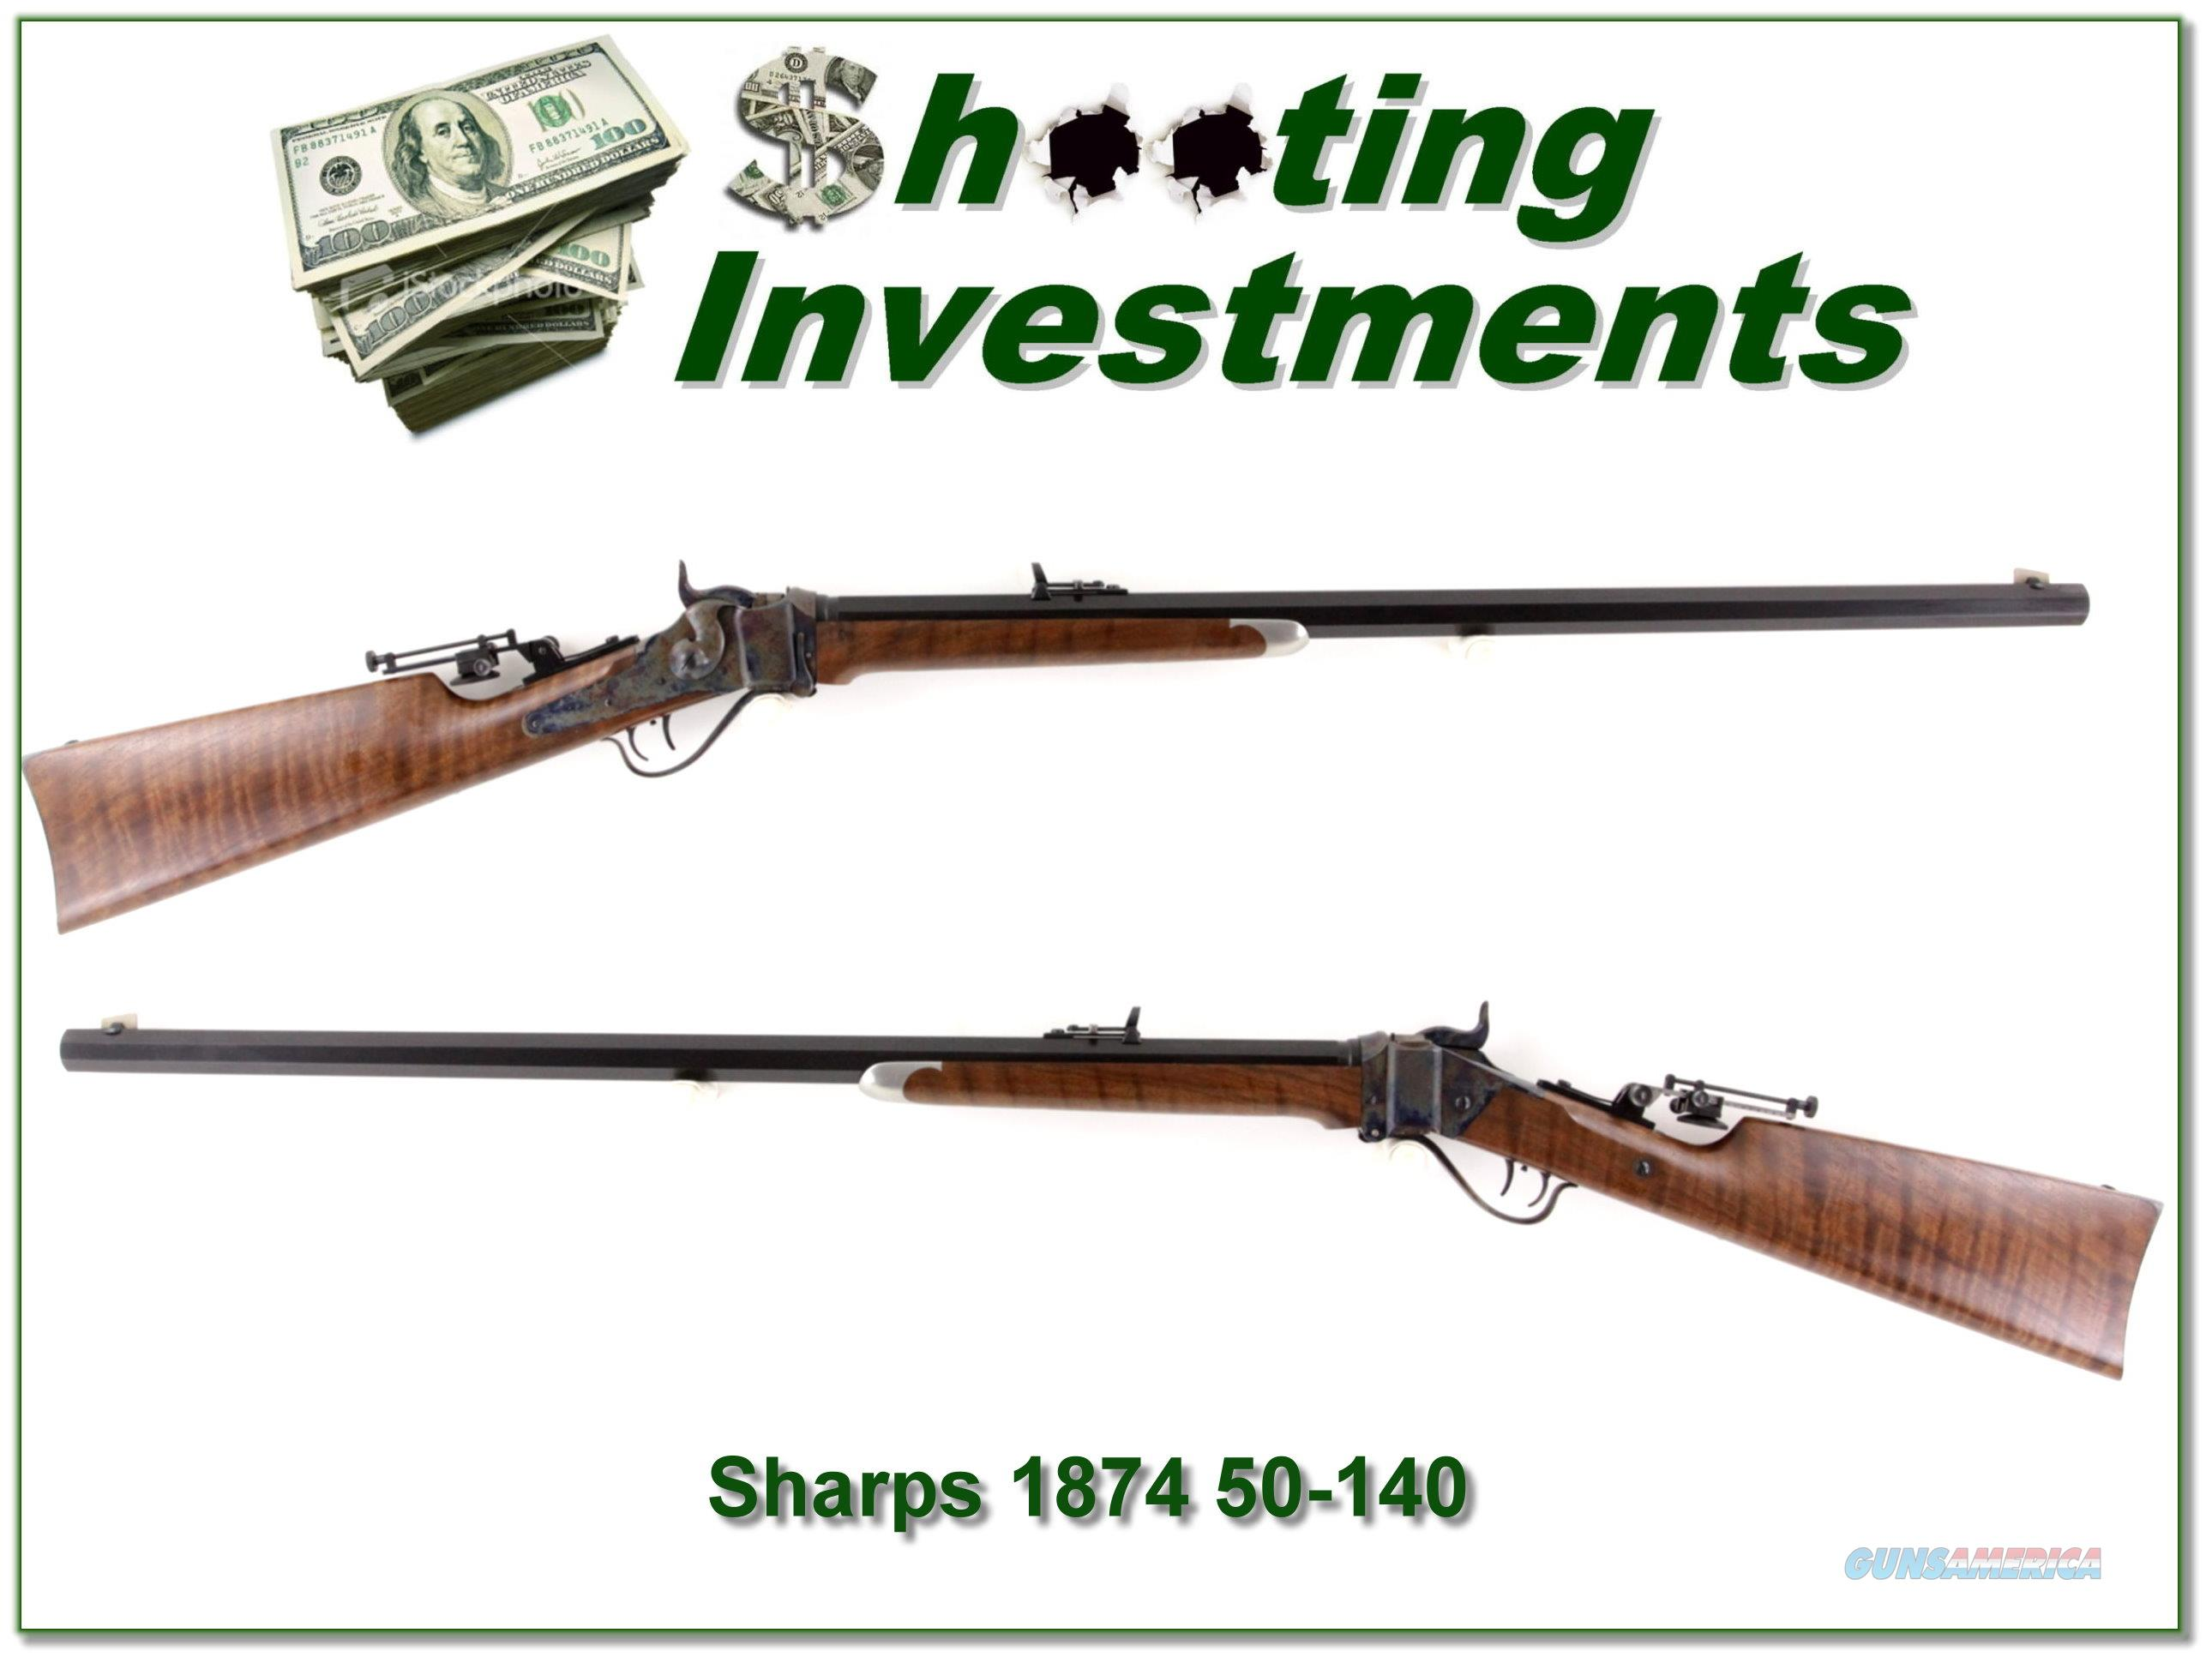 C. Sharps 1874 heavy barrel Hartford collar 50-140  Guns > Rifles > Sharps Rifles - Replica